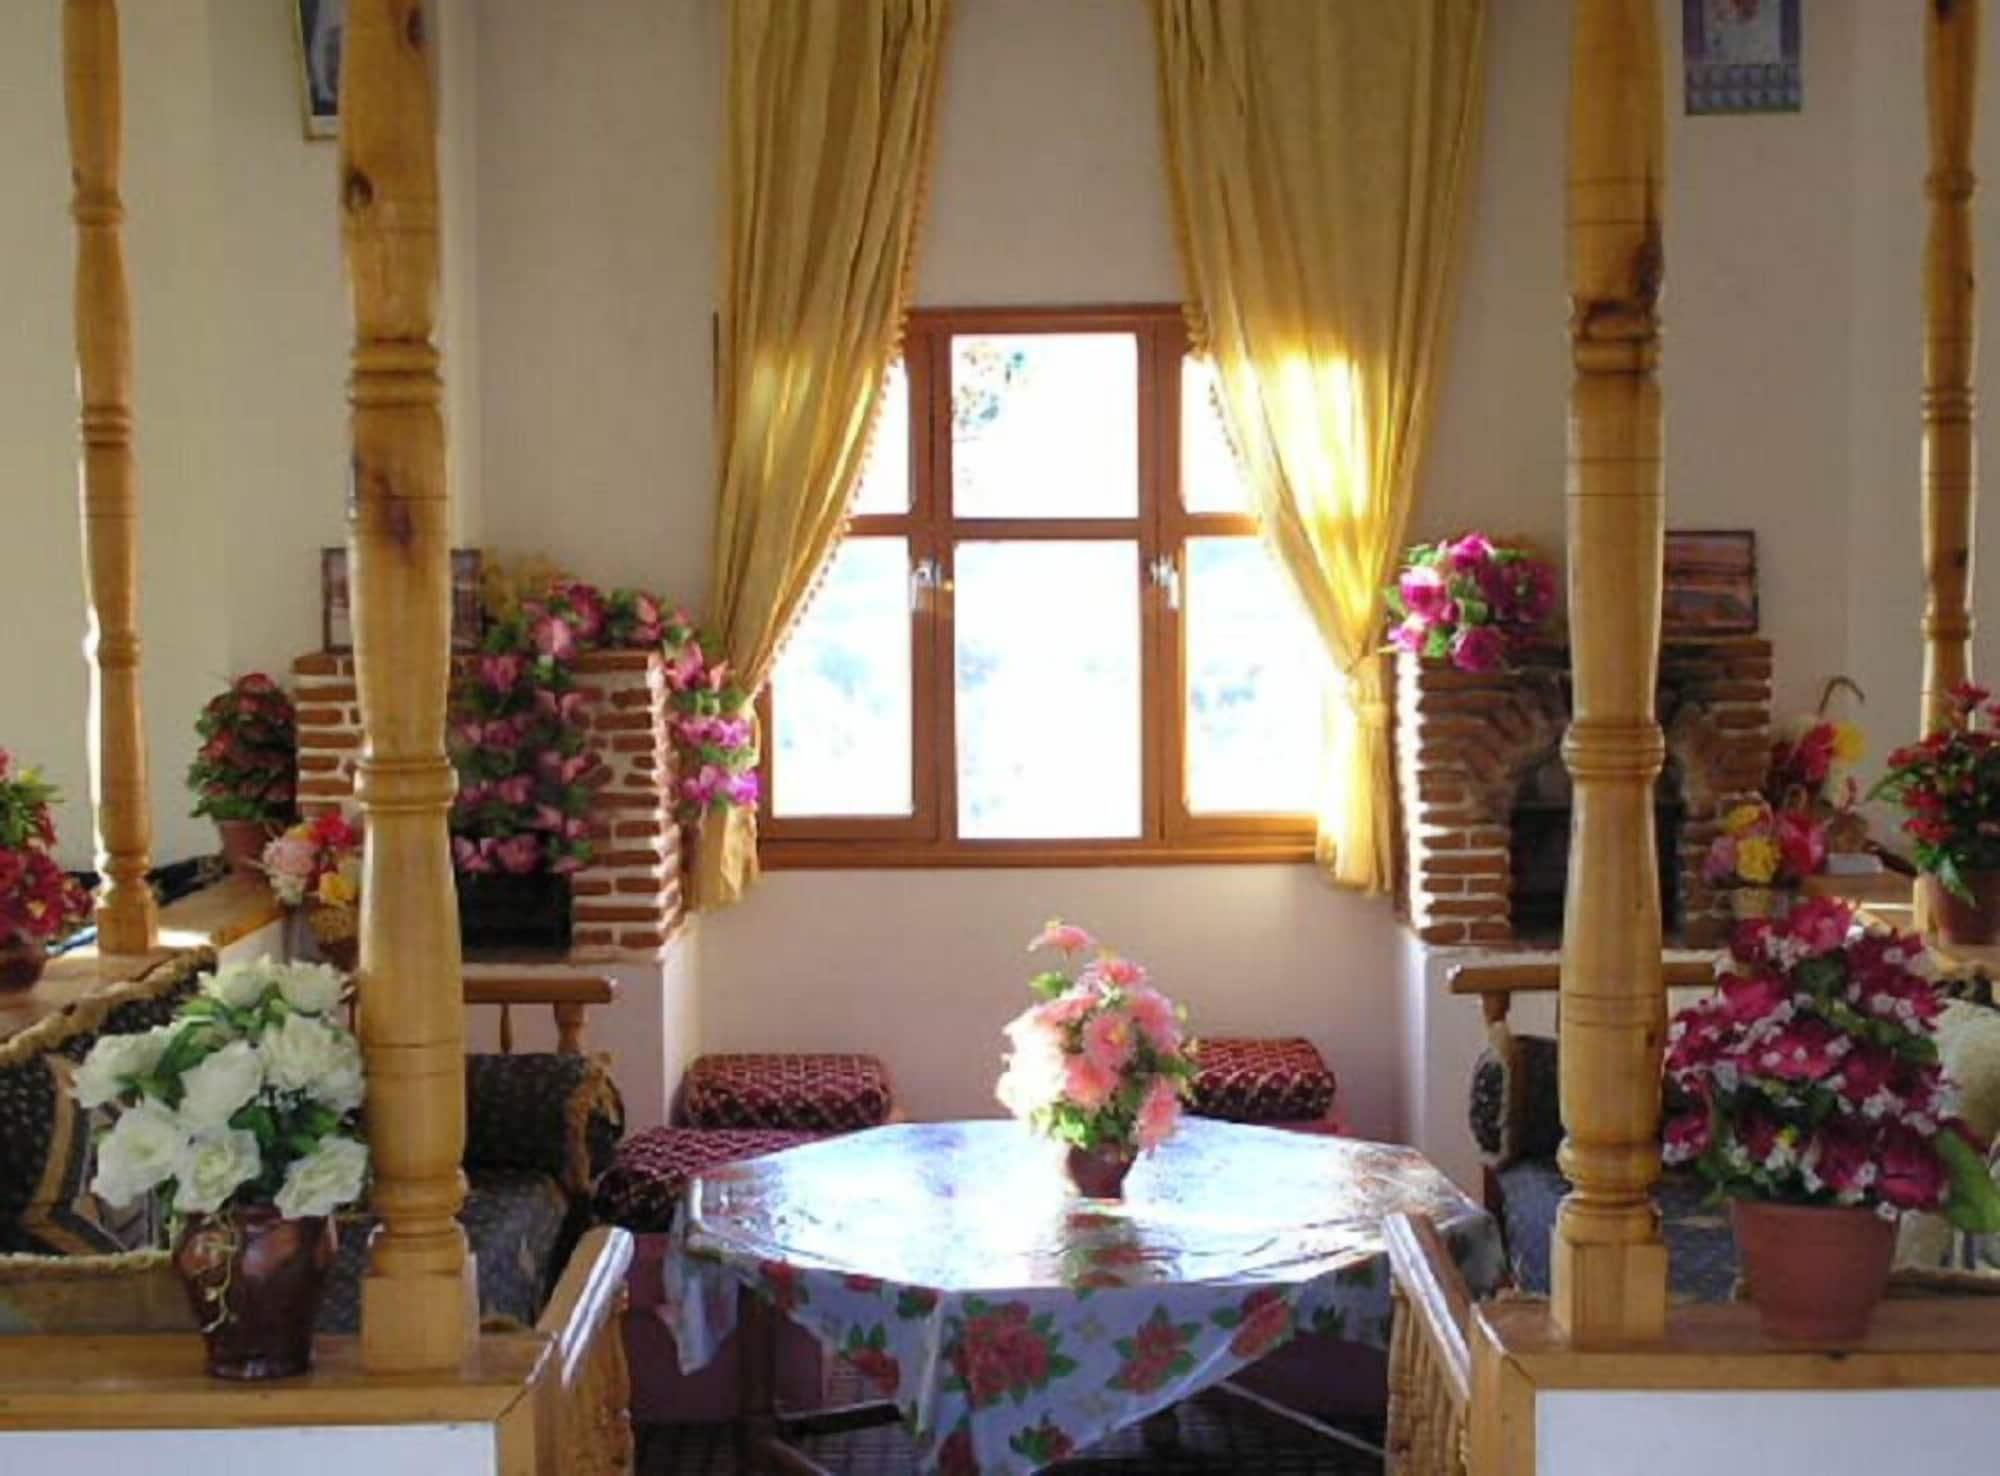 Auberge Toubkal, Taroudannt